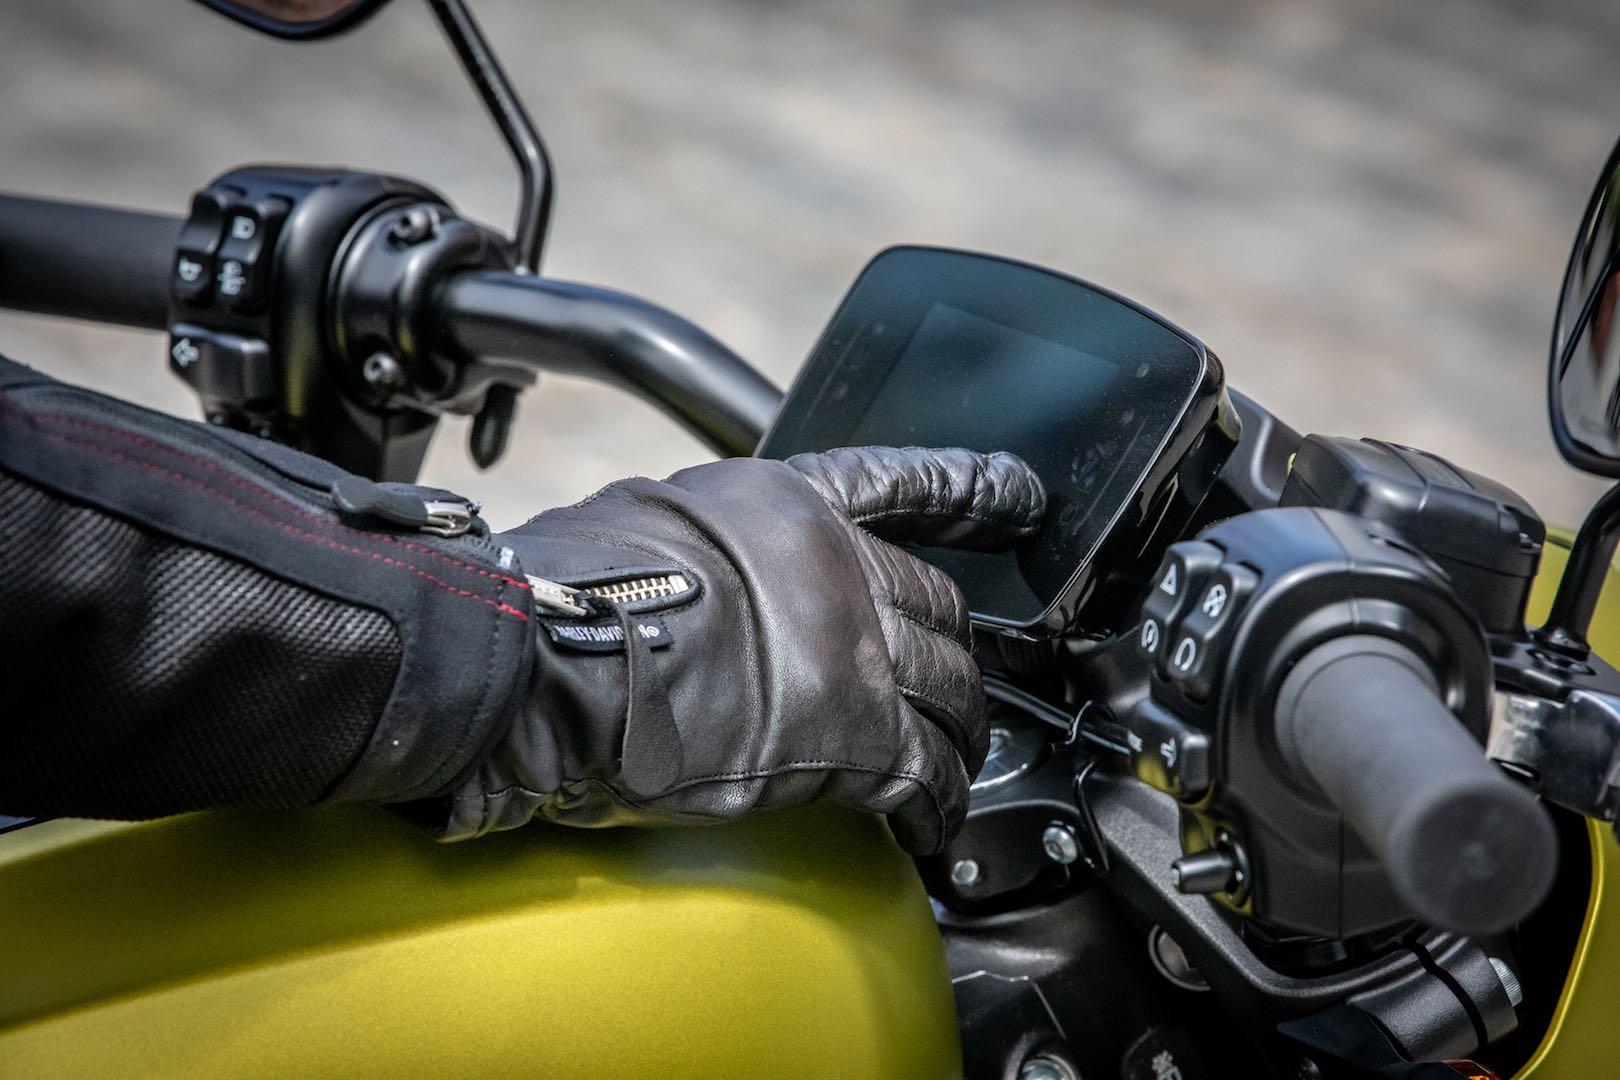 Harley LiveWire touchscreen dash